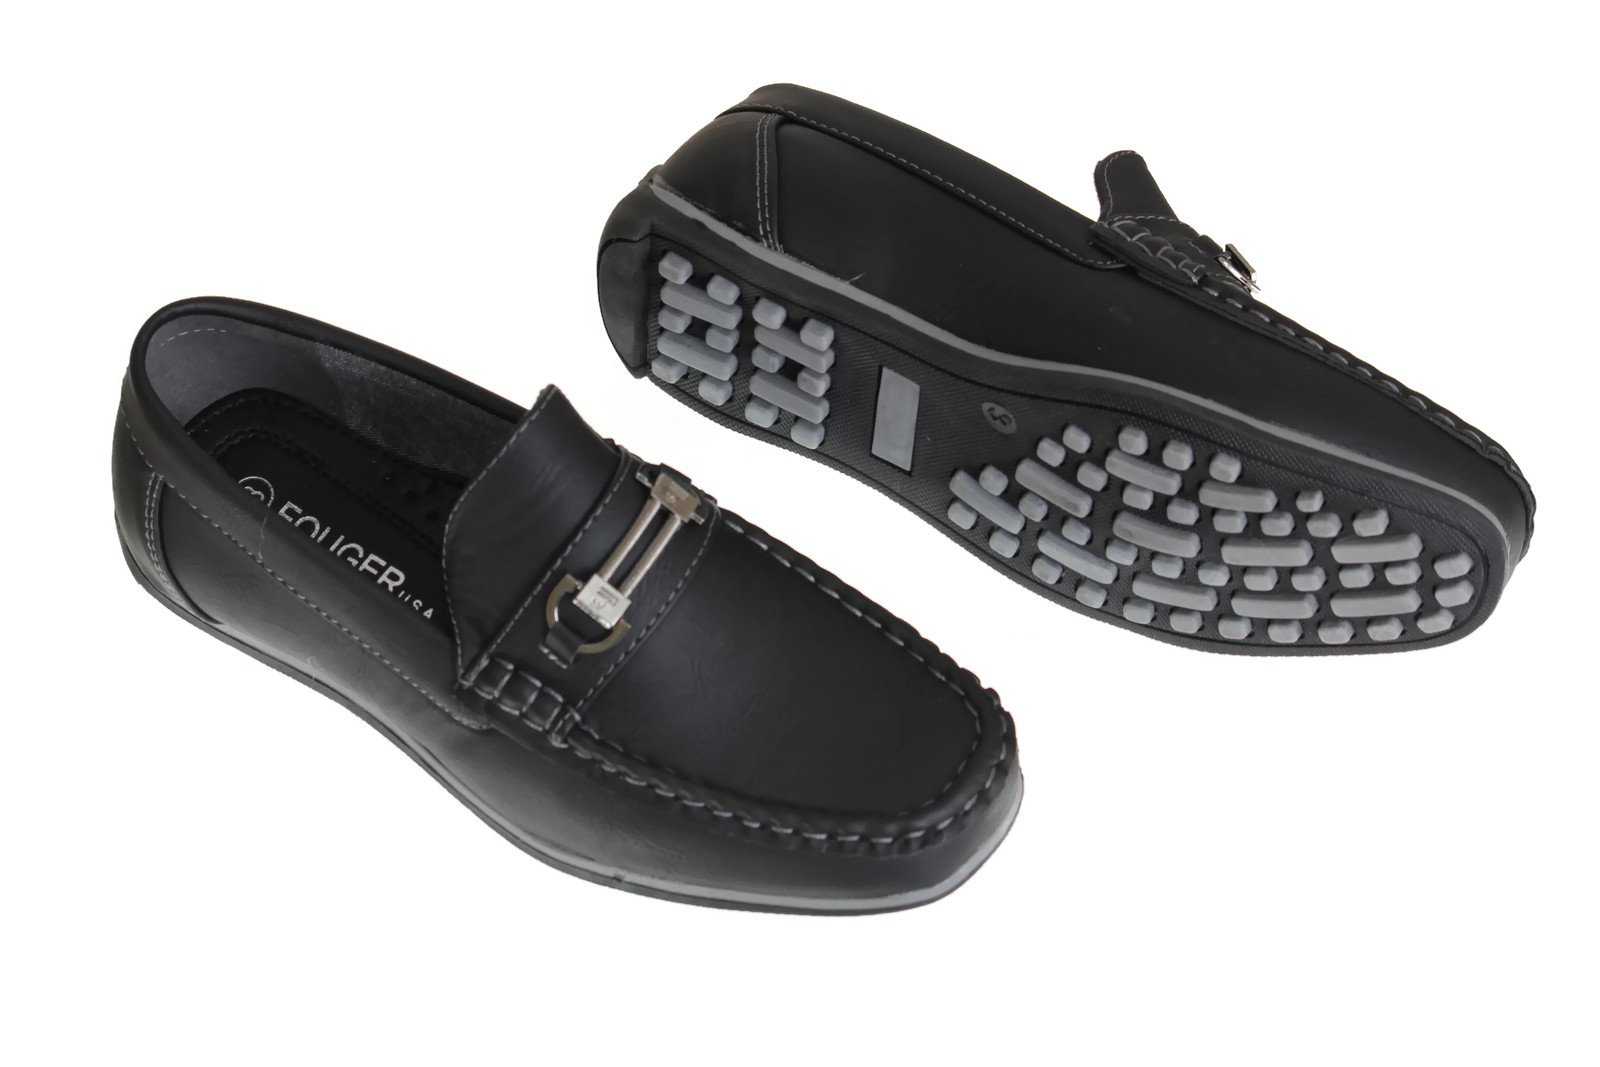 Little Boys 10 to Big Boys 7 Black Slip on Loafer Dress Shoes (Todd 9)